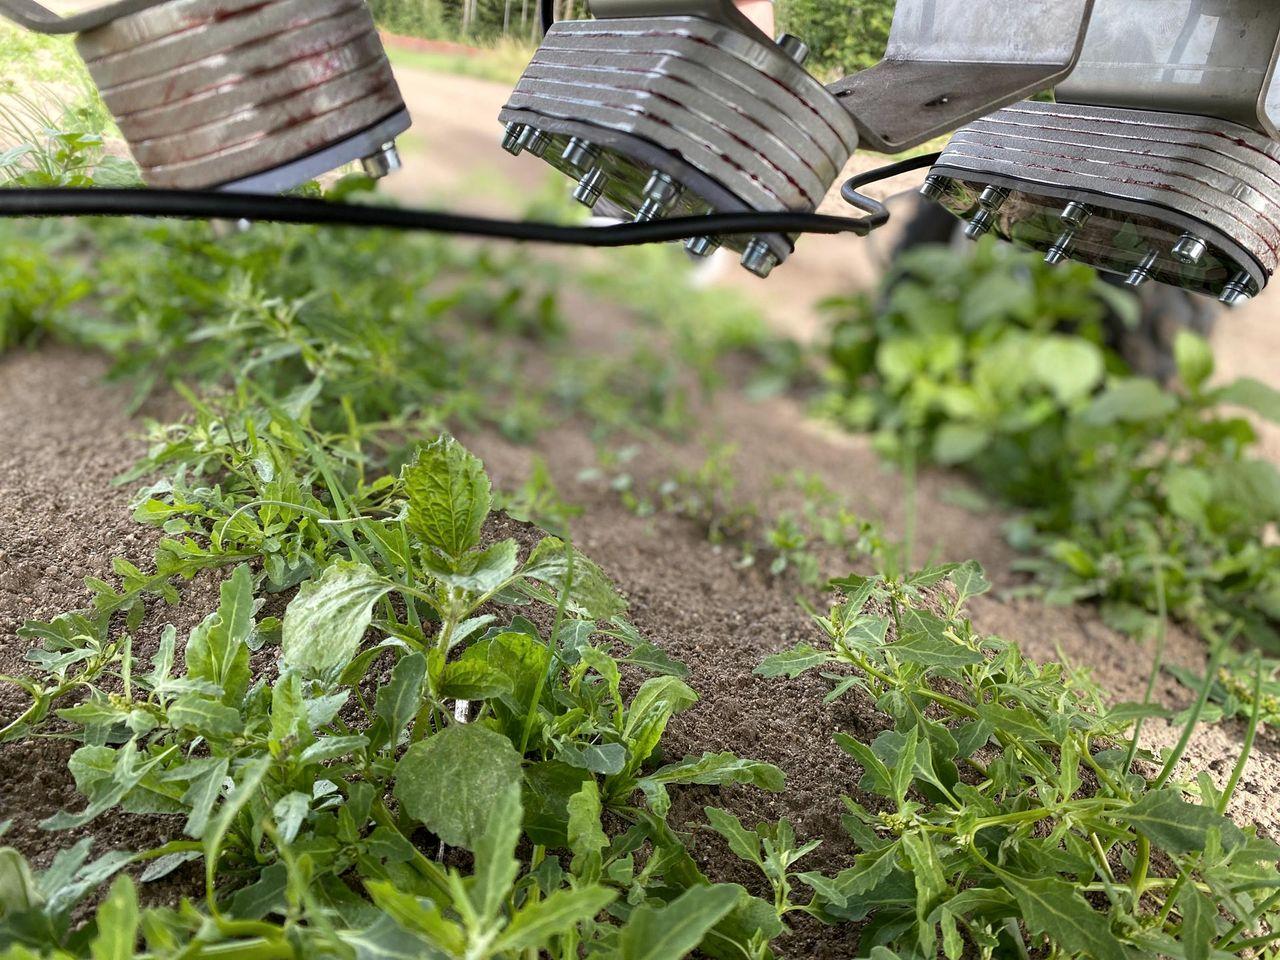 Svenska Ekobot rensar ogräs på egen hand